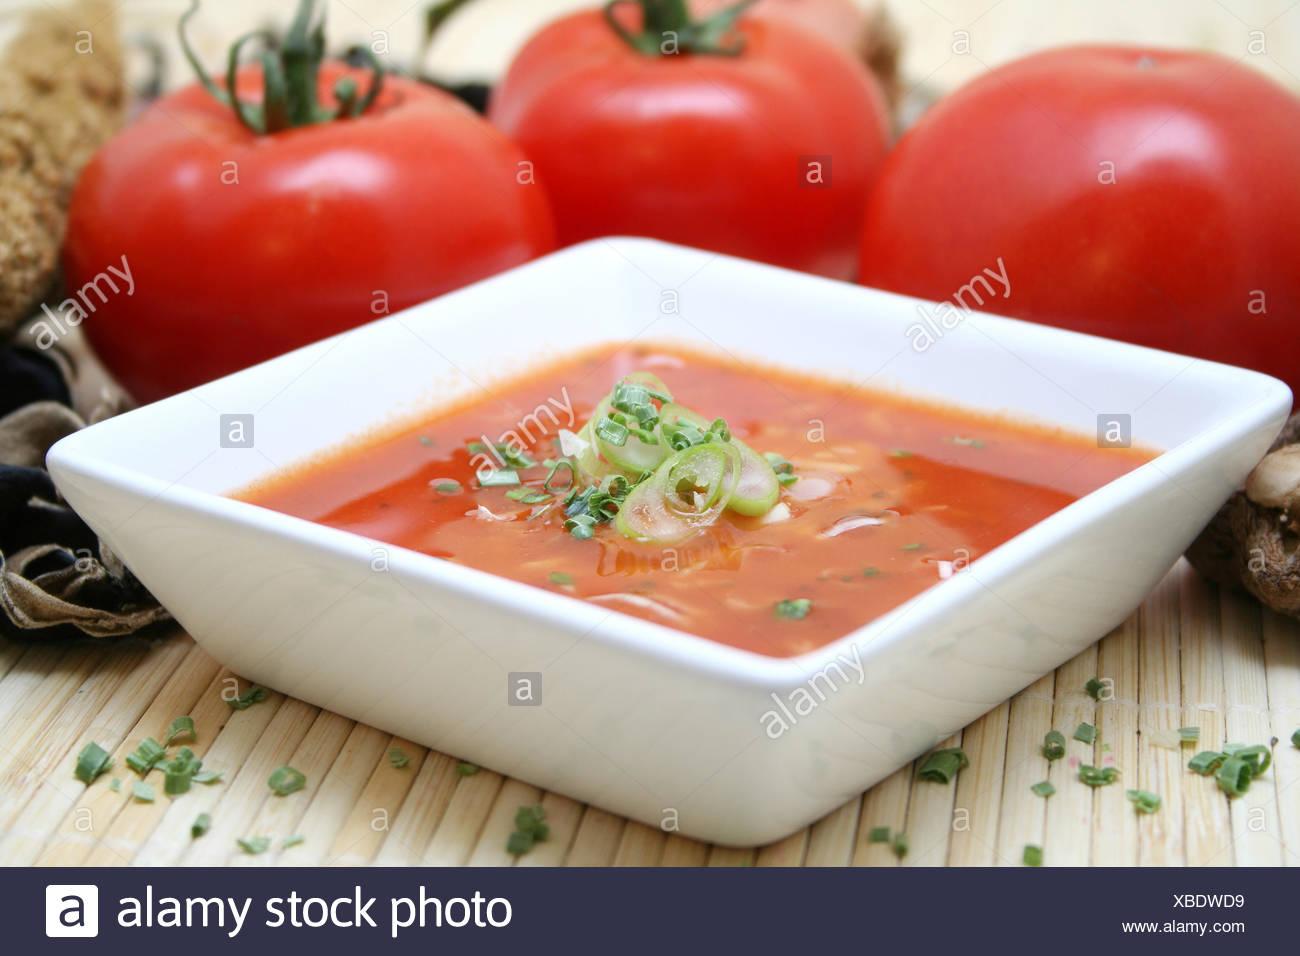 vegetable vital vegetarian - Stock Image